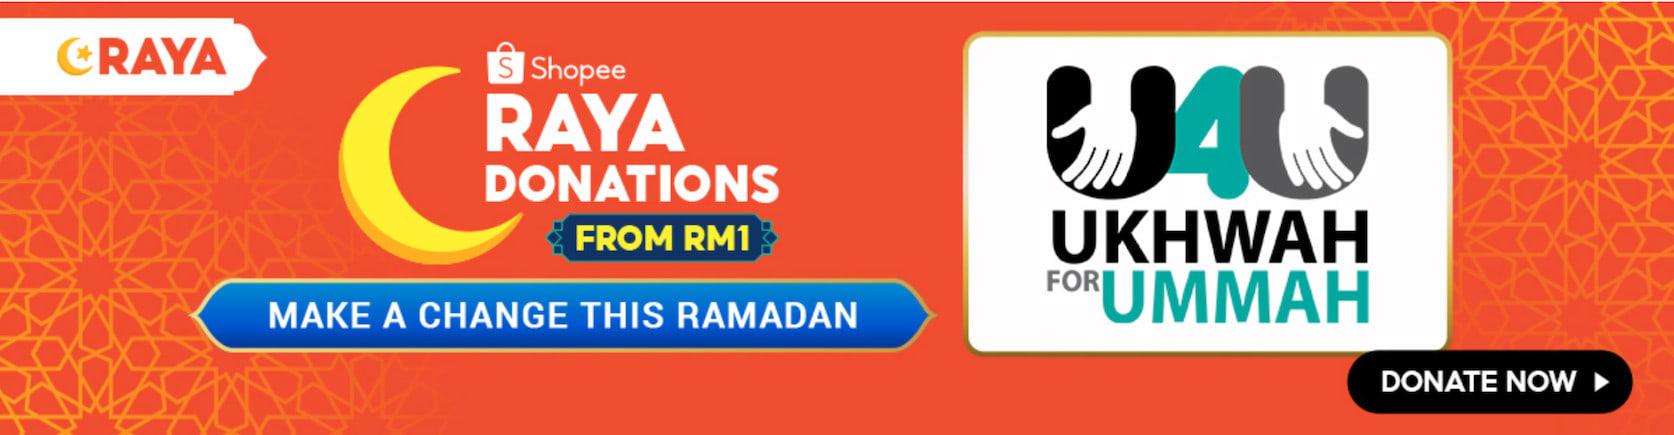 shopee raya sale malaysia donate